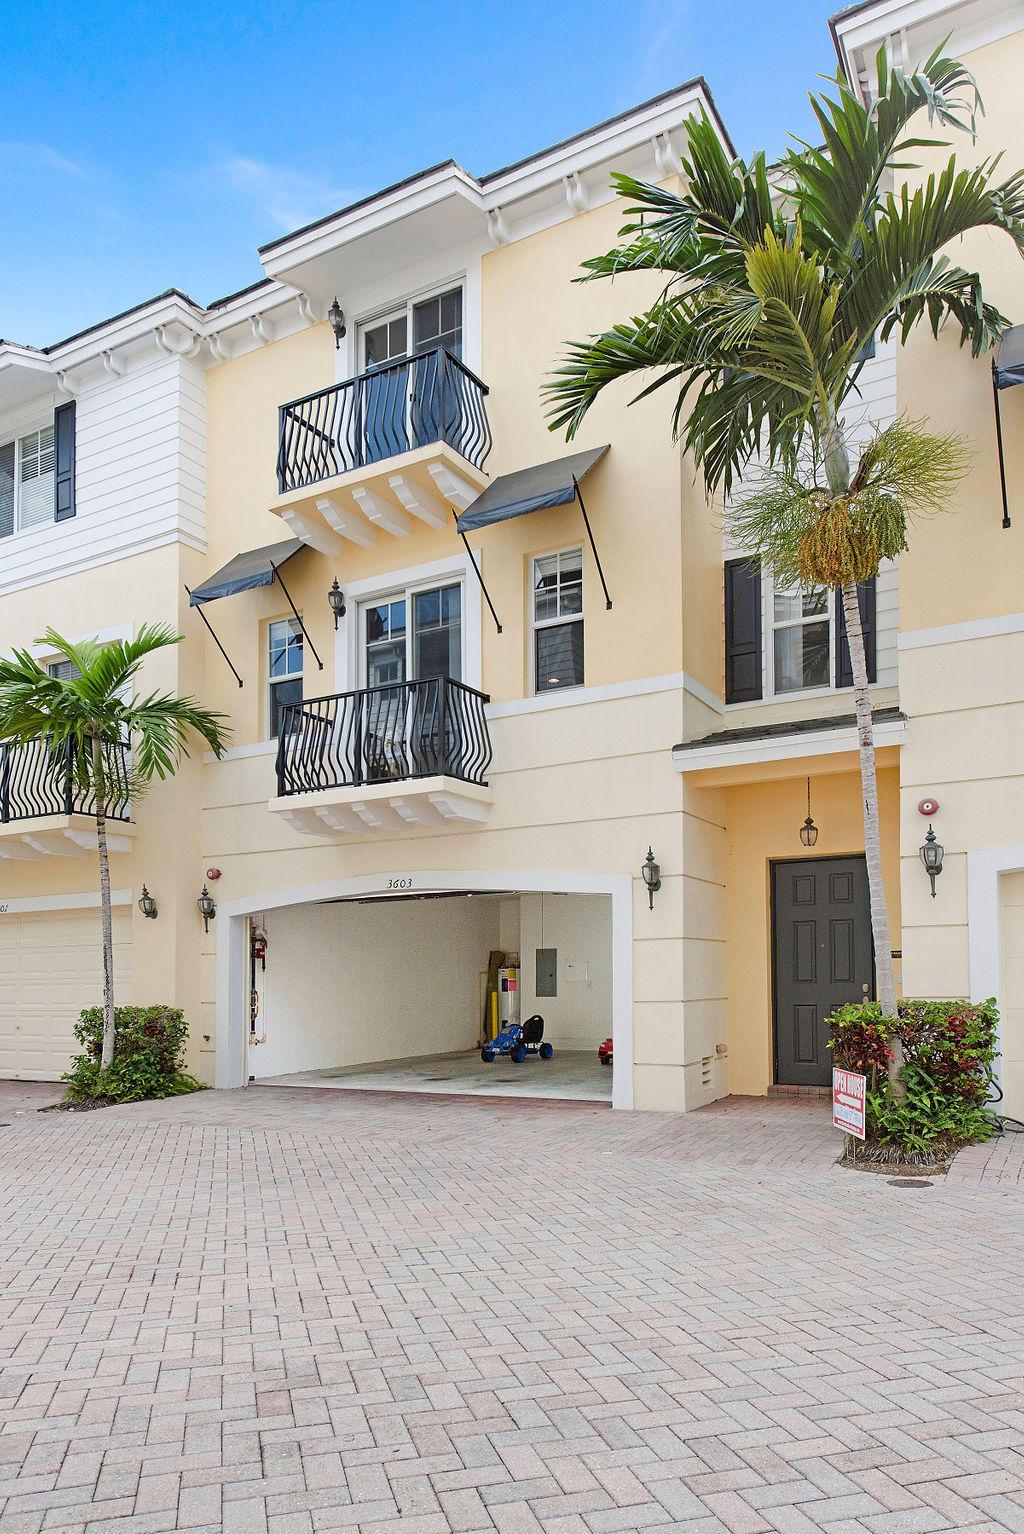 Home for sale in Vistazo AT Boca Raton Boca Raton Florida